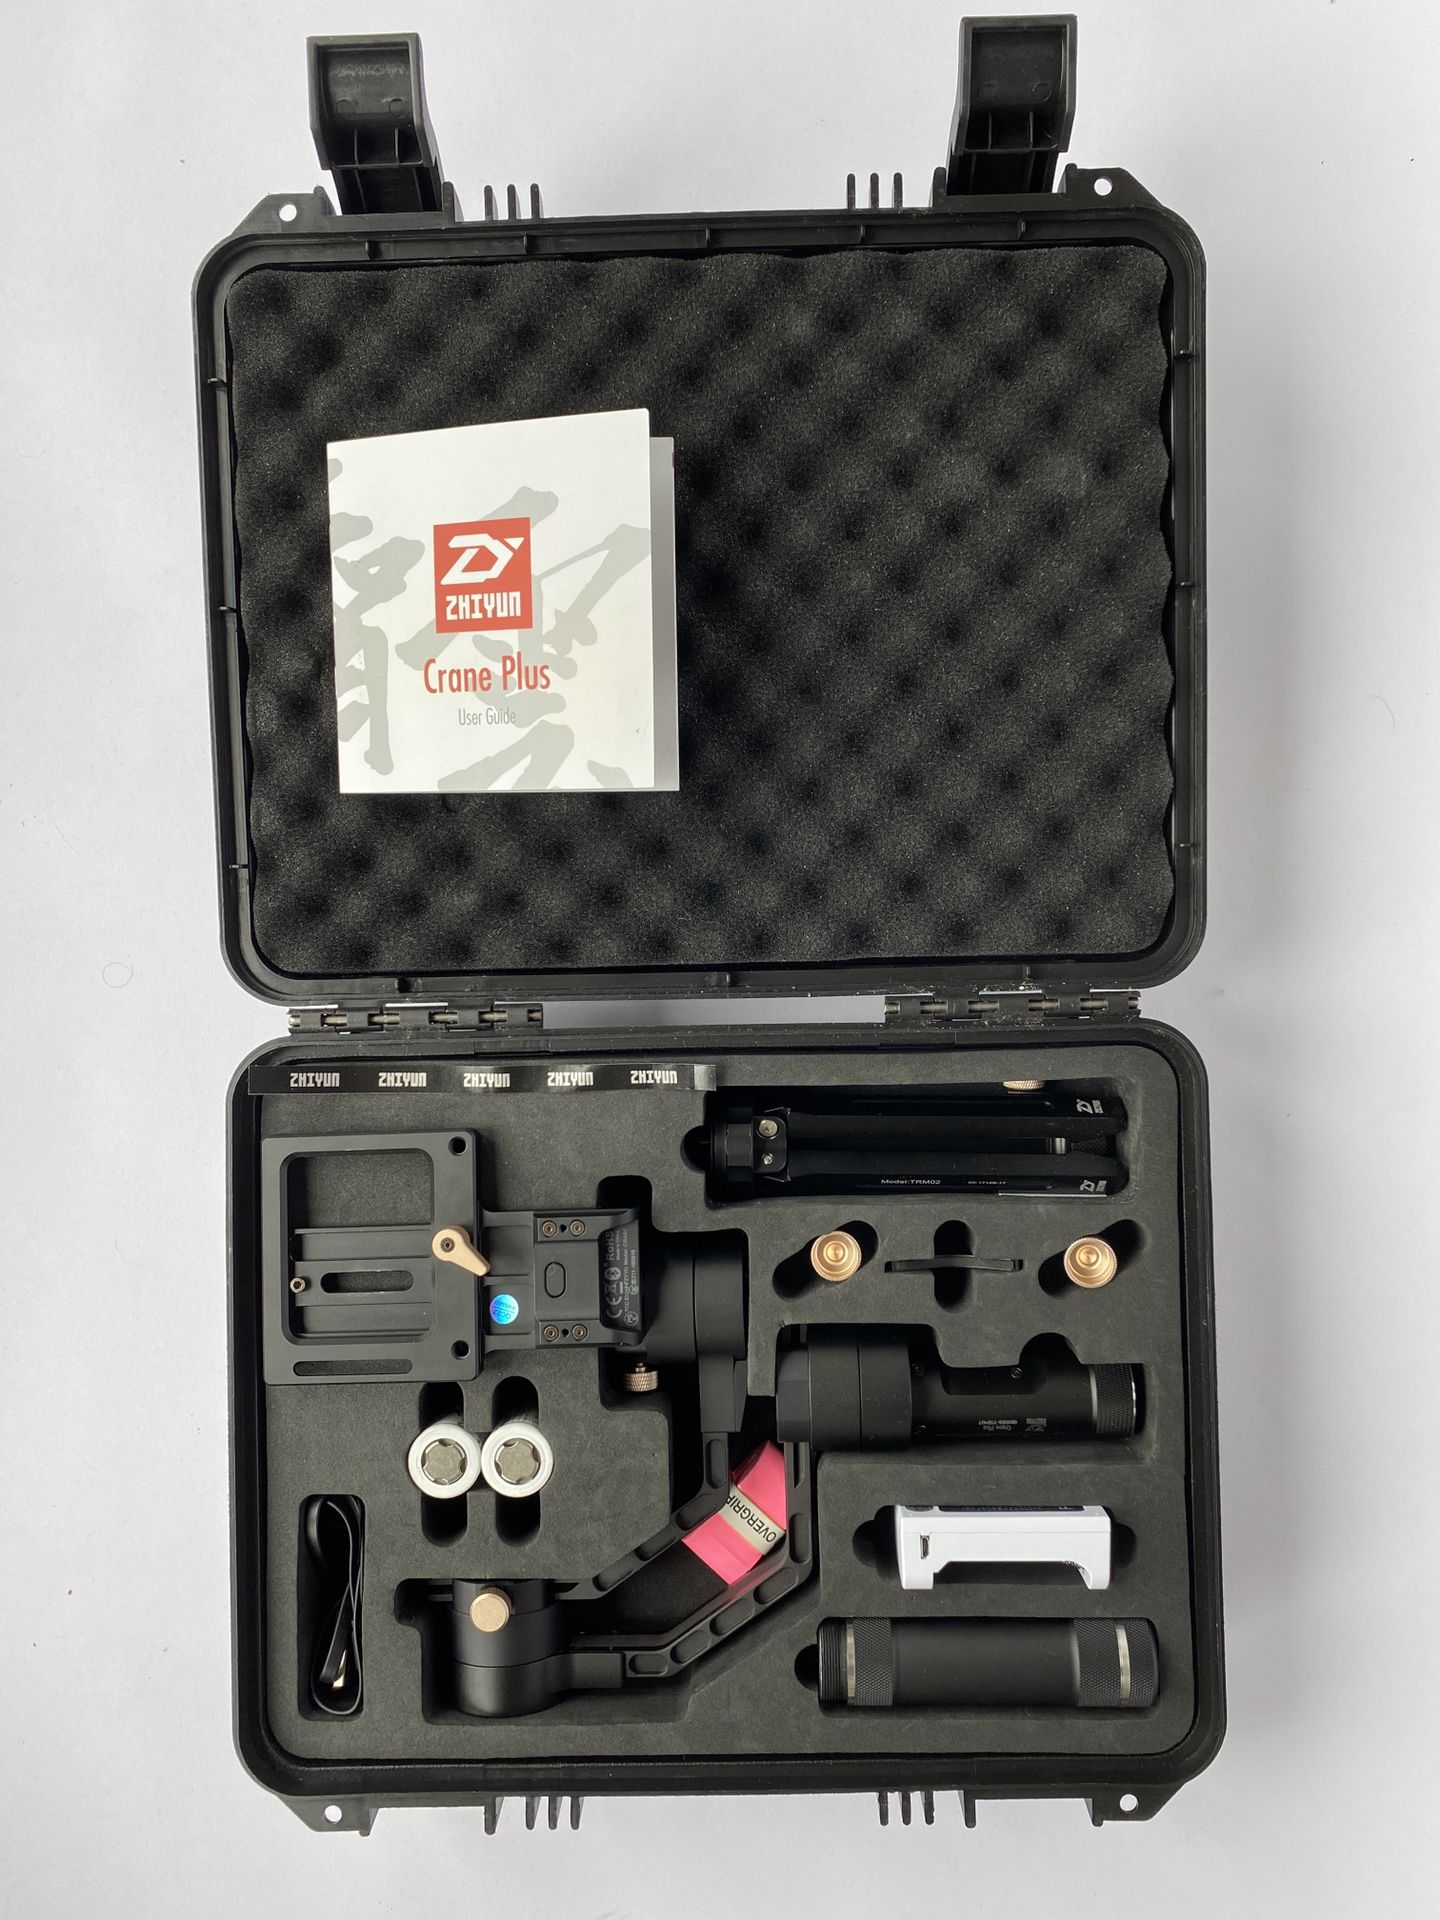 Zhiyun Crane Plus Handheld Gimbal